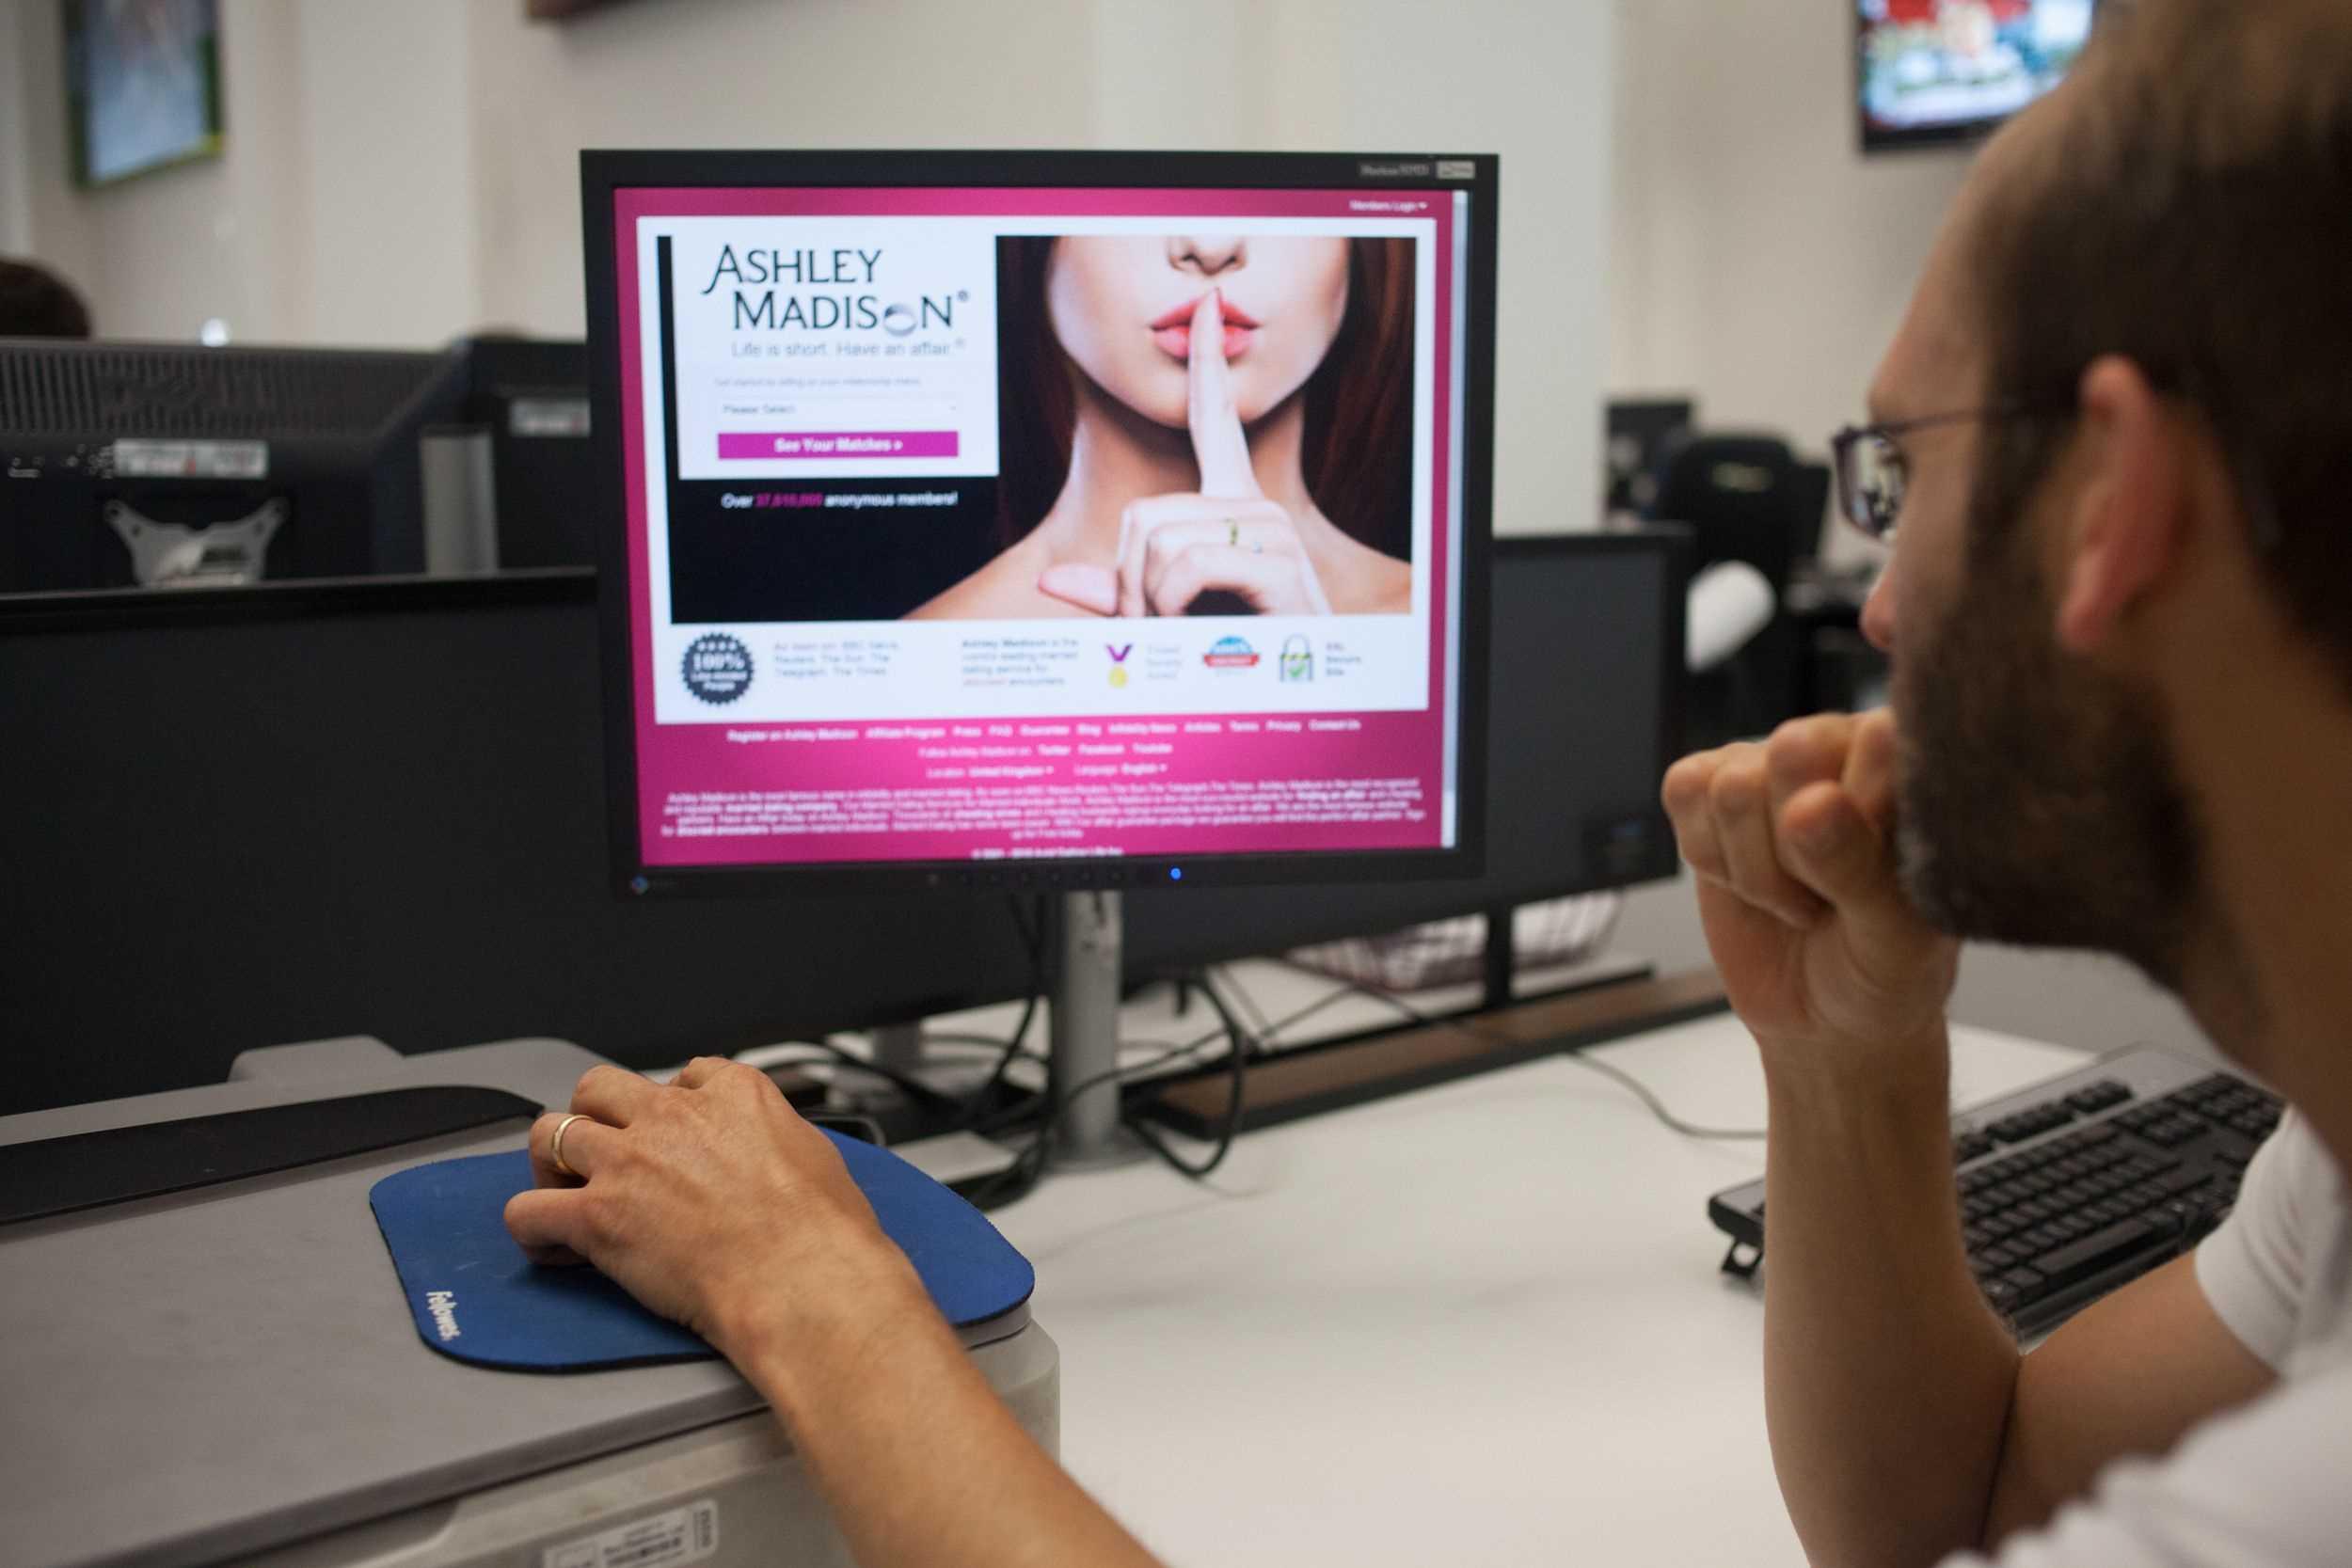 Ashley Madison hack highlights cyber extortion risks